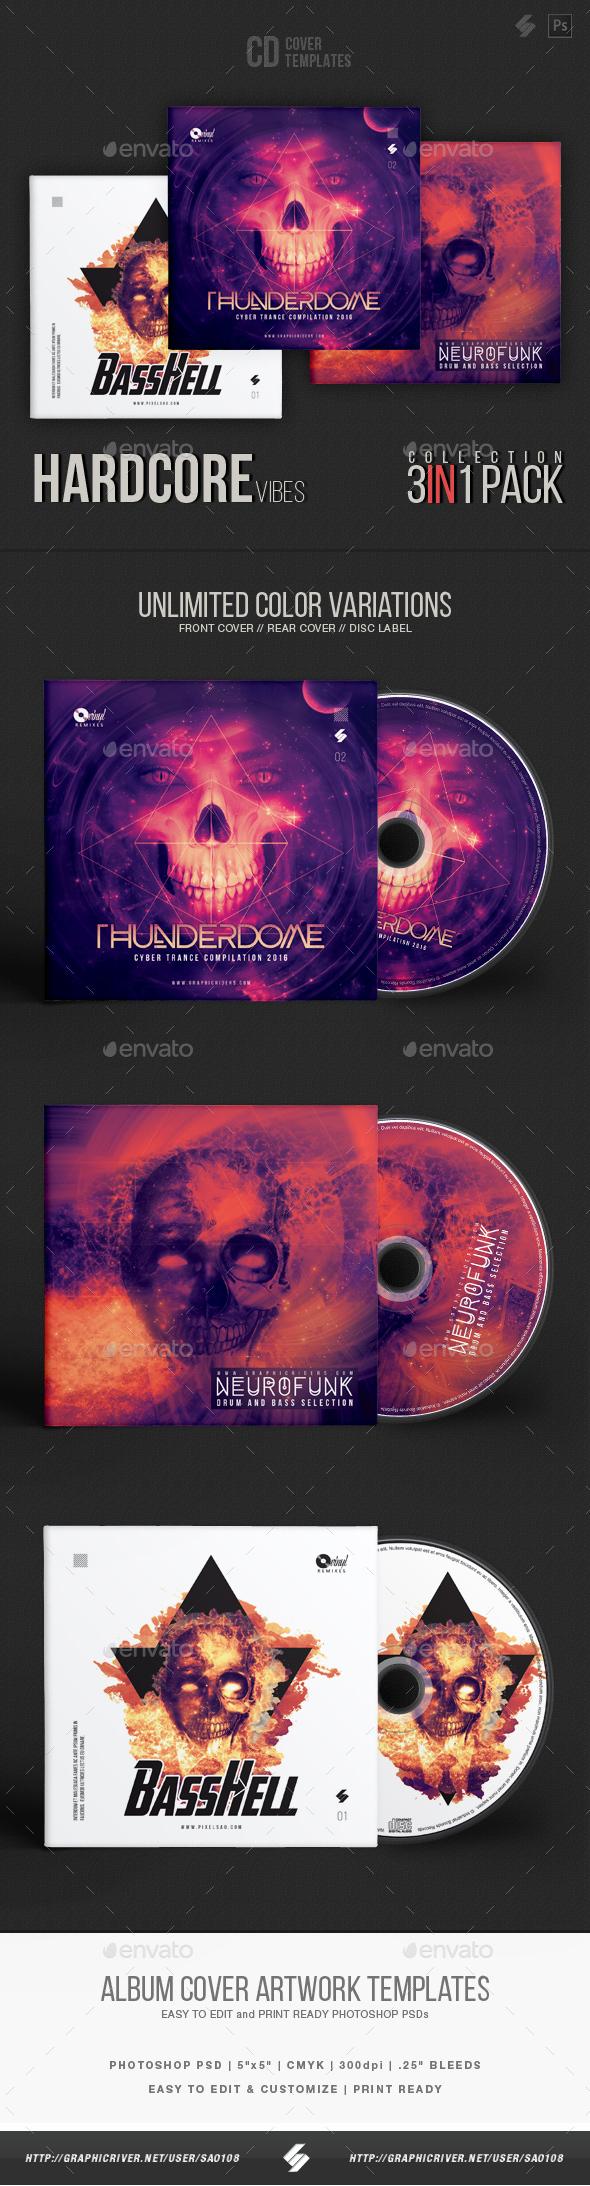 Hardcore Vibes - CD Cover Artwork Templates Bundle - CD & DVD Artwork Print Templates